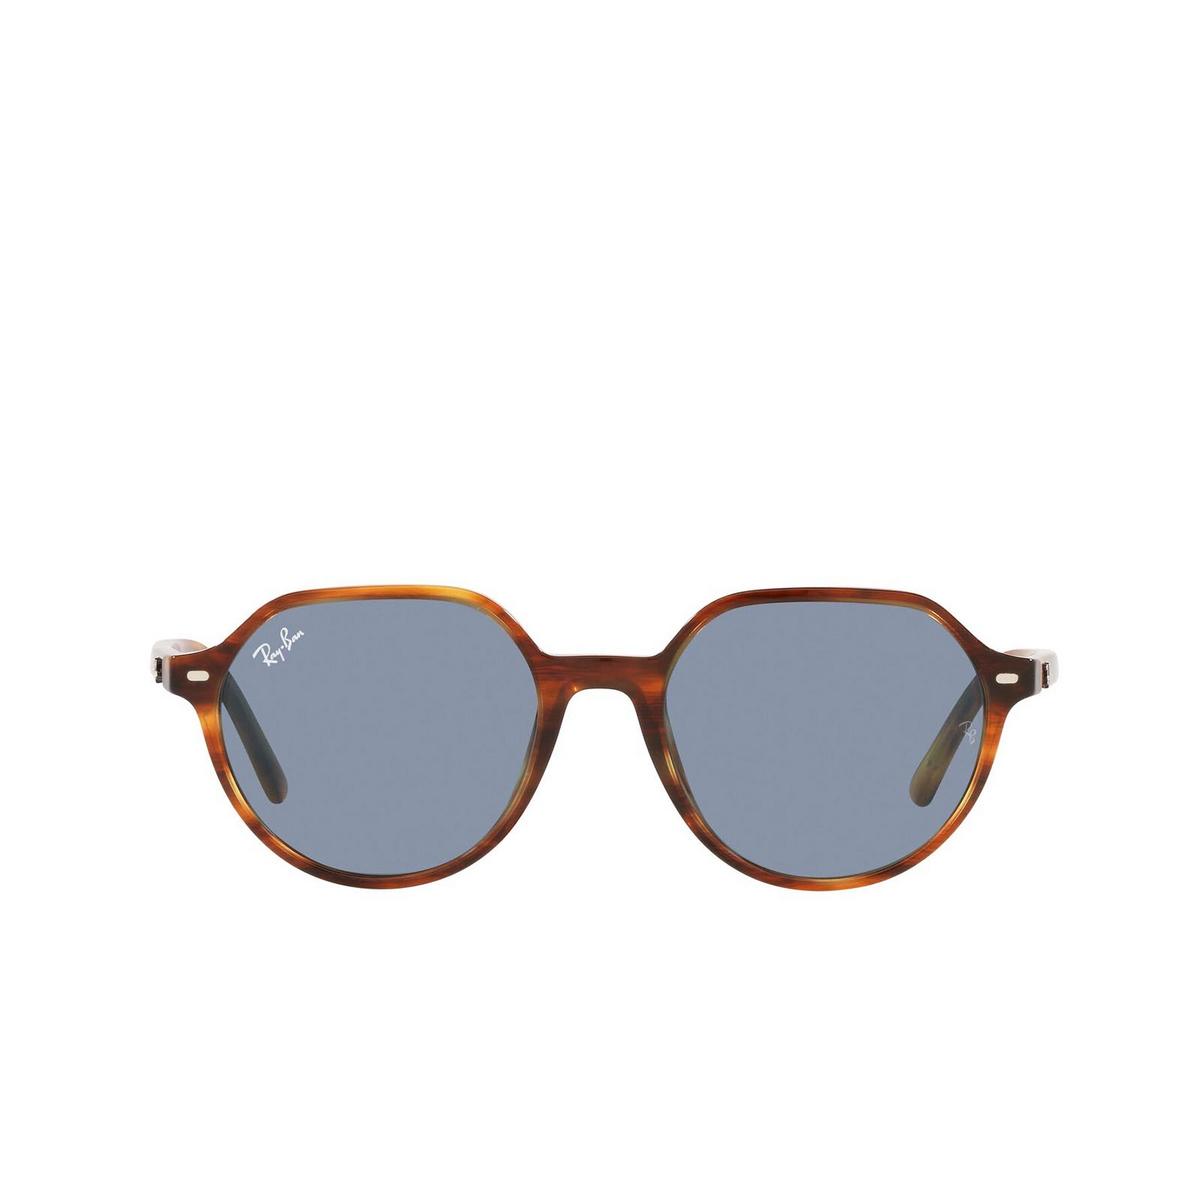 Ray-Ban® Irregular Sunglasses: Thalia RB2195 color Striped Havana 954/62.